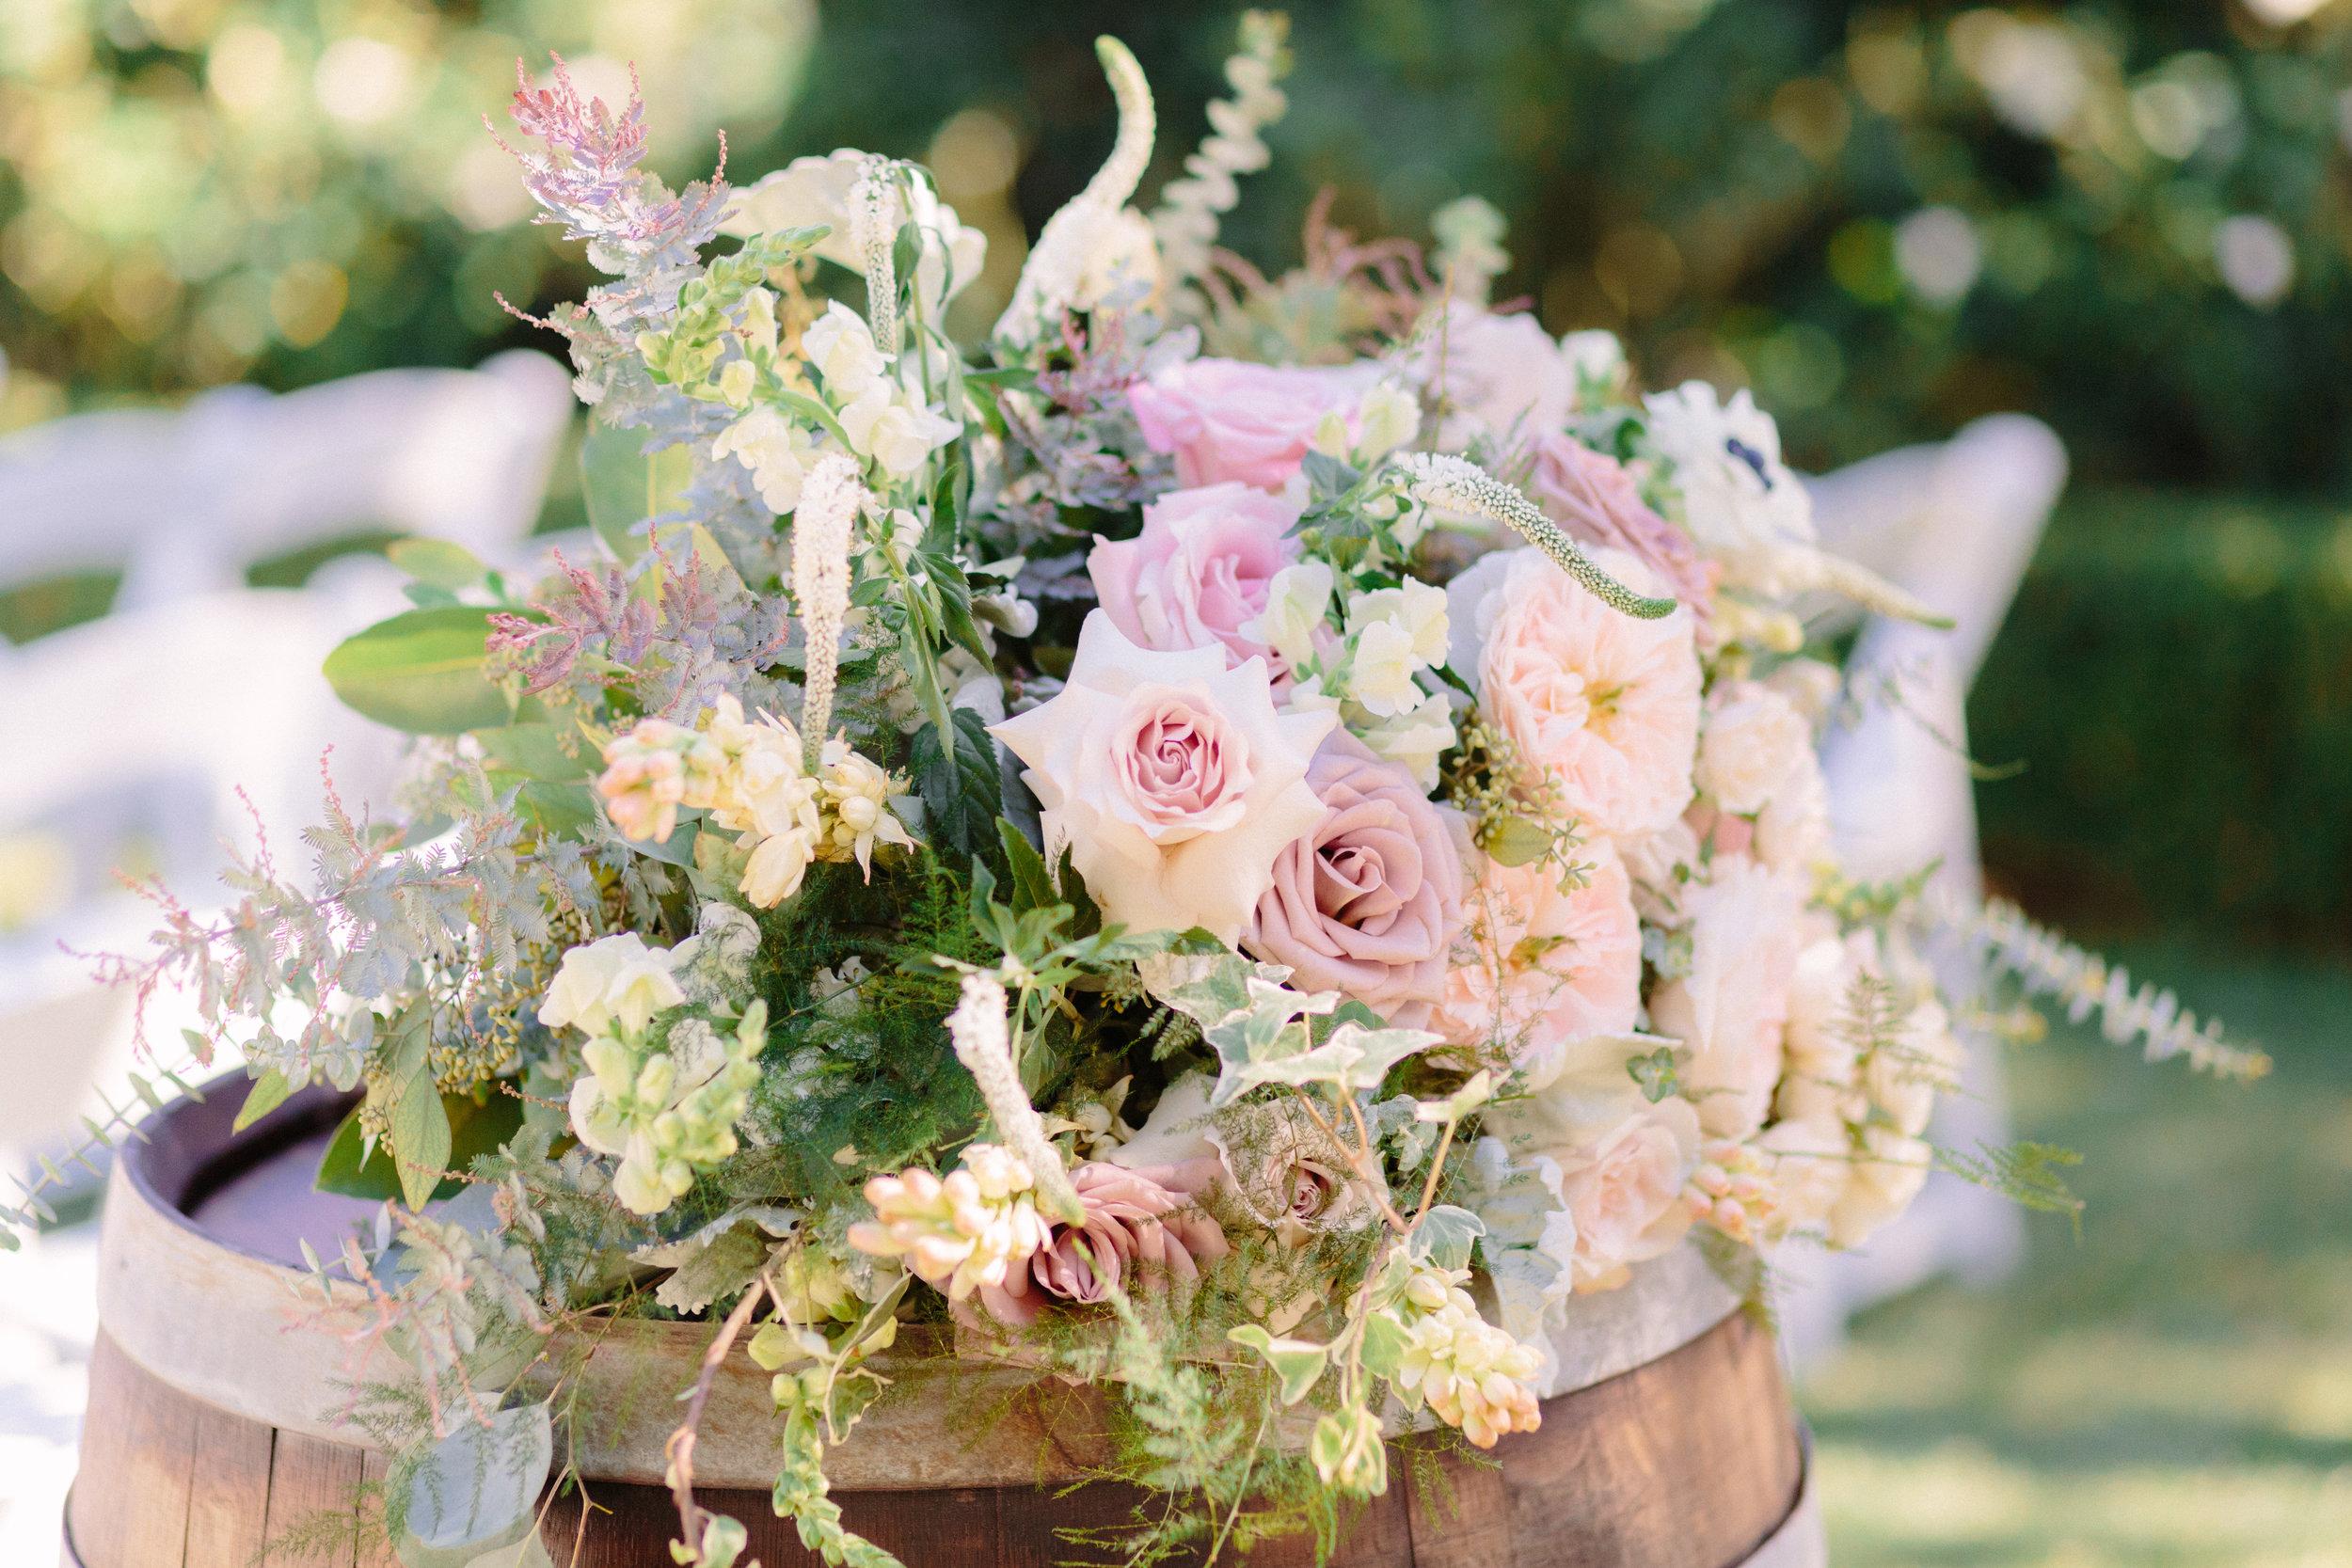 180915-Brittany-Josh-WED-davidmanningphotographer.com-0534.jpg